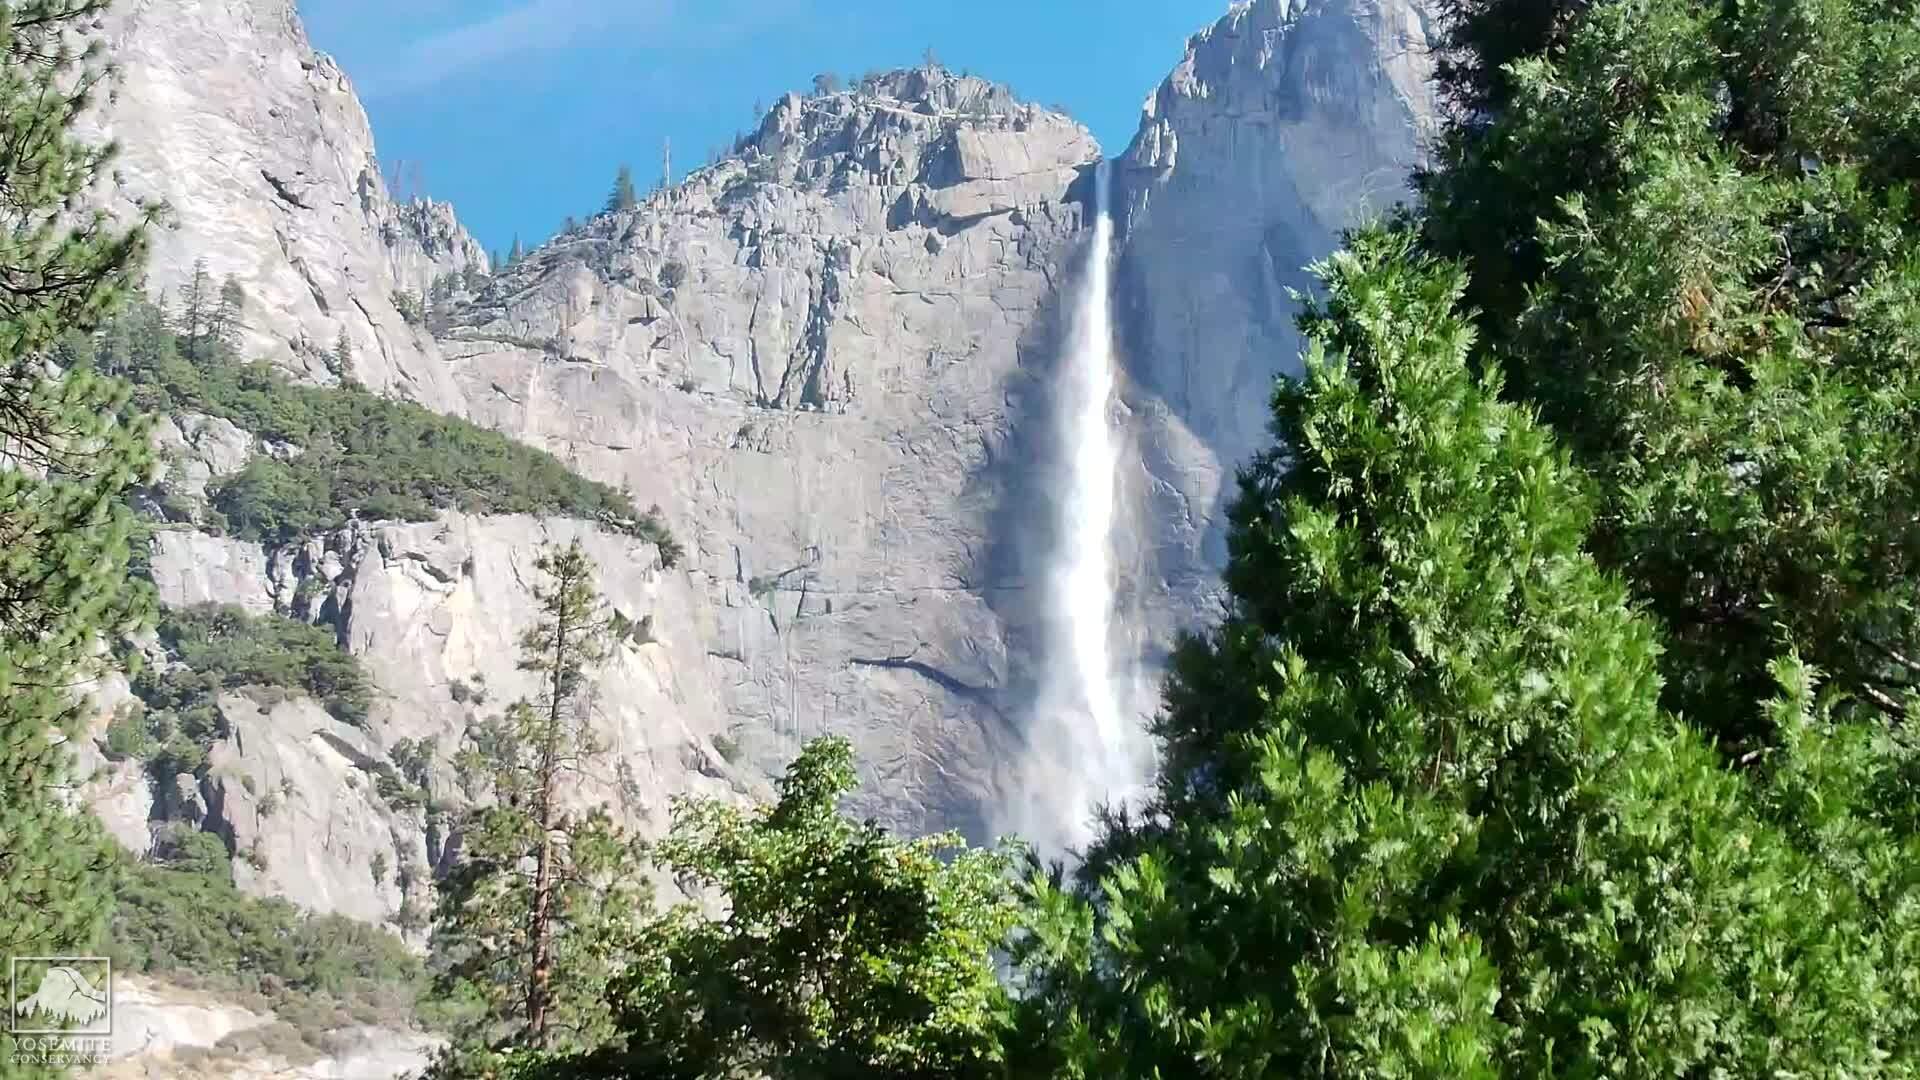 View of Upper Yosemite Fall